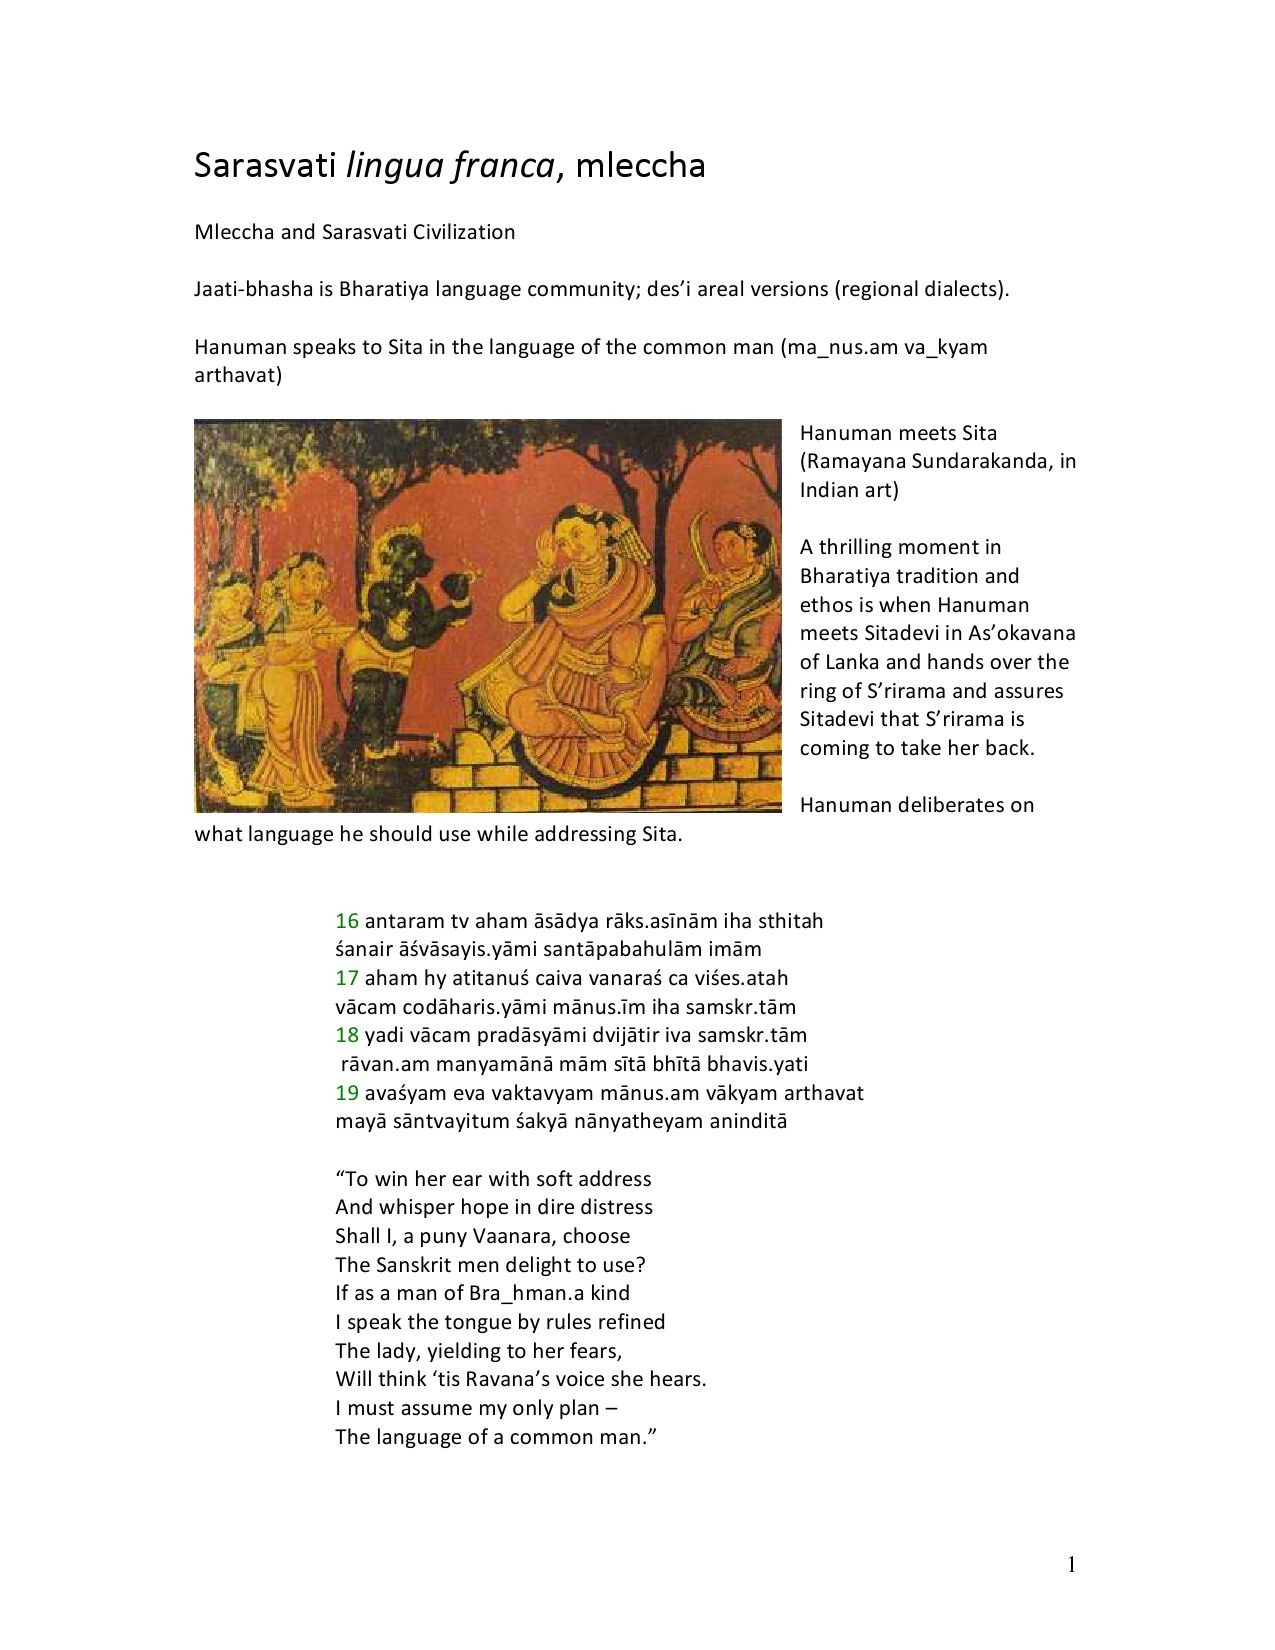 Nanakshahi Calendar March 2019 Recientes Sarasvati Lingua Franca Mleccha by Kalyan97 issuu Of Nanakshahi Calendar March 2019 Más Recientes School Year Calendars School Year Calendars